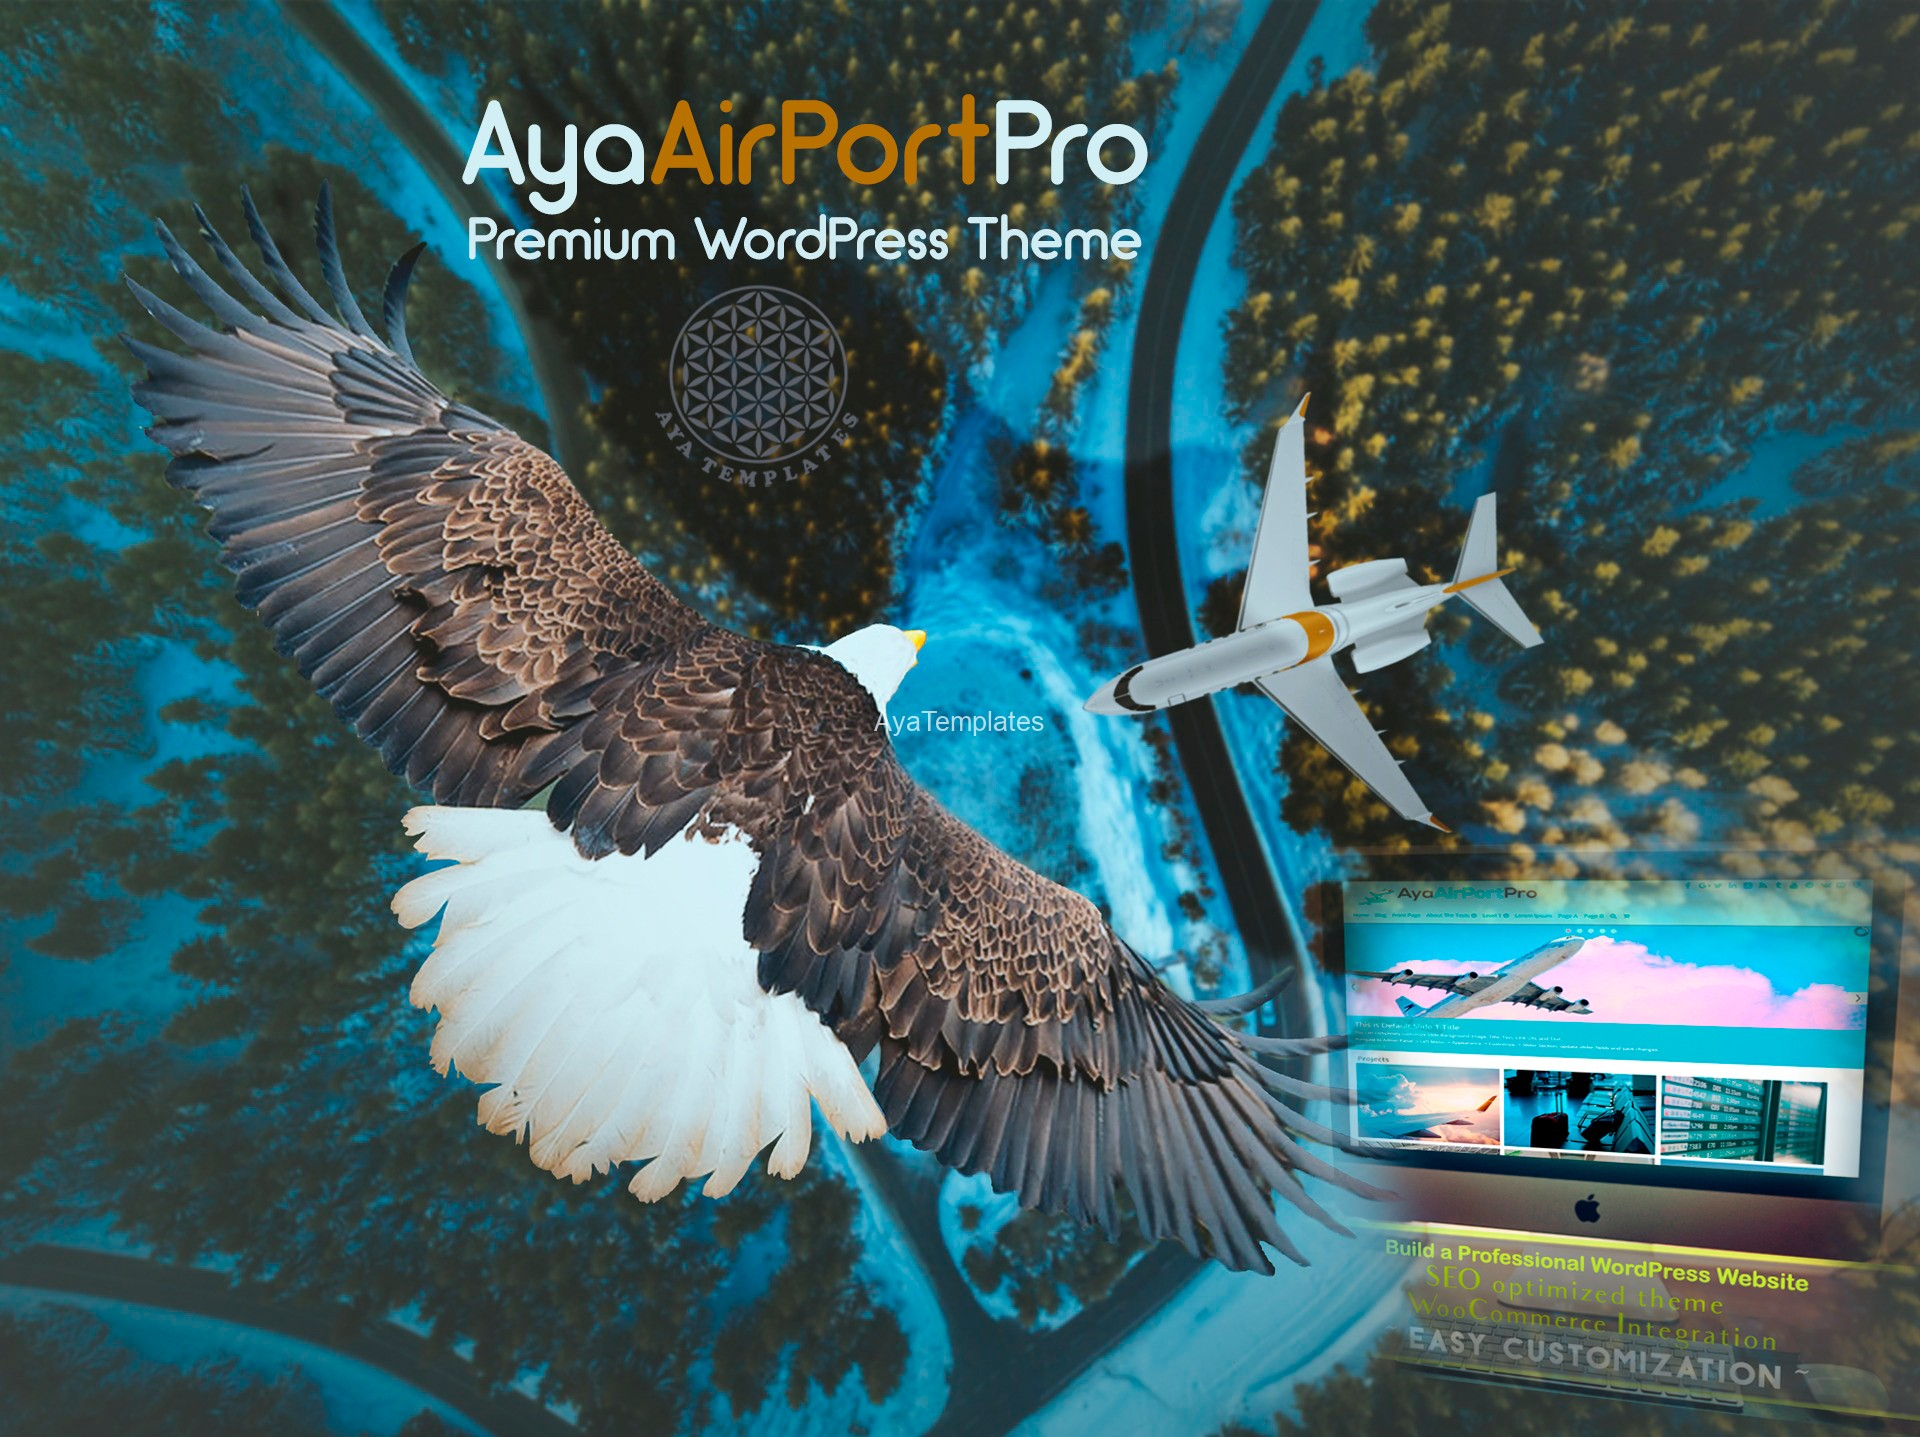 AyaAirPortPro---premium---wordpress--theme-mockup